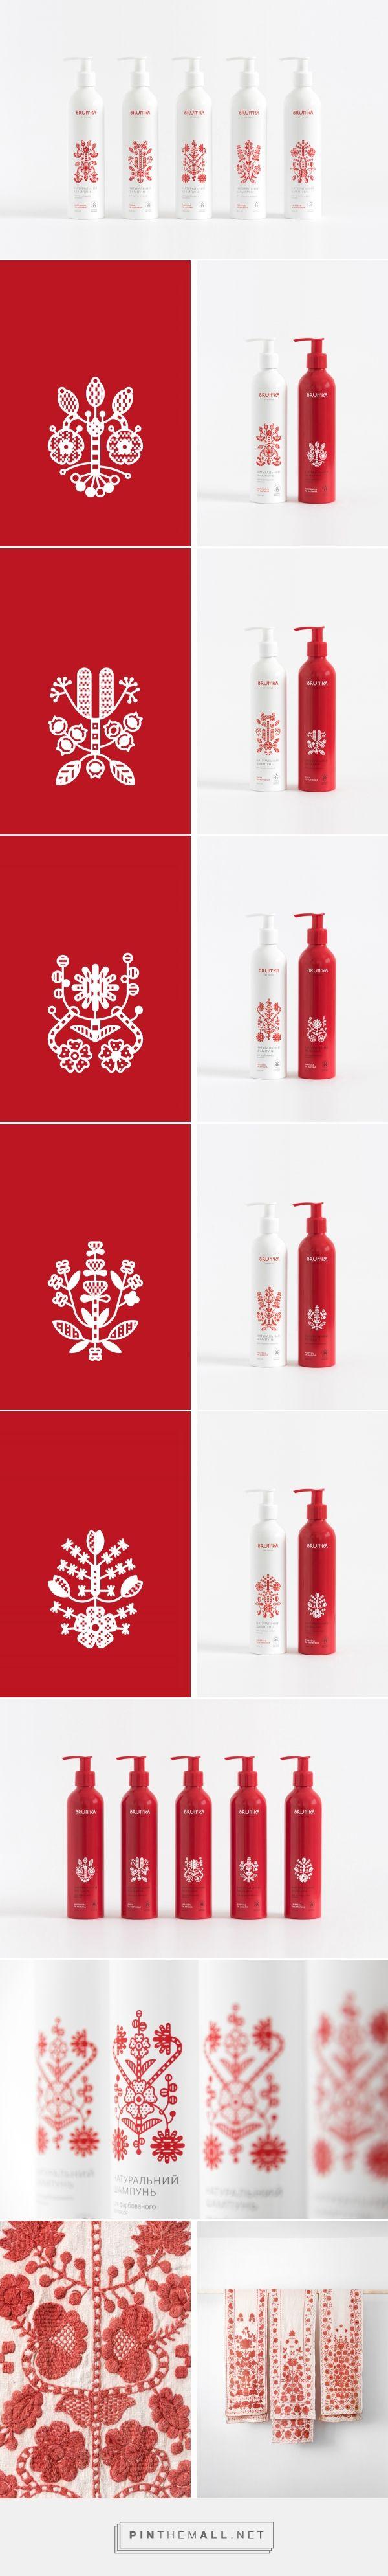 Brun'ka cosmetics packaging design by Yurko Gutsulyak - http://www.packagingoftheworld.com/2017/03/brunka.html